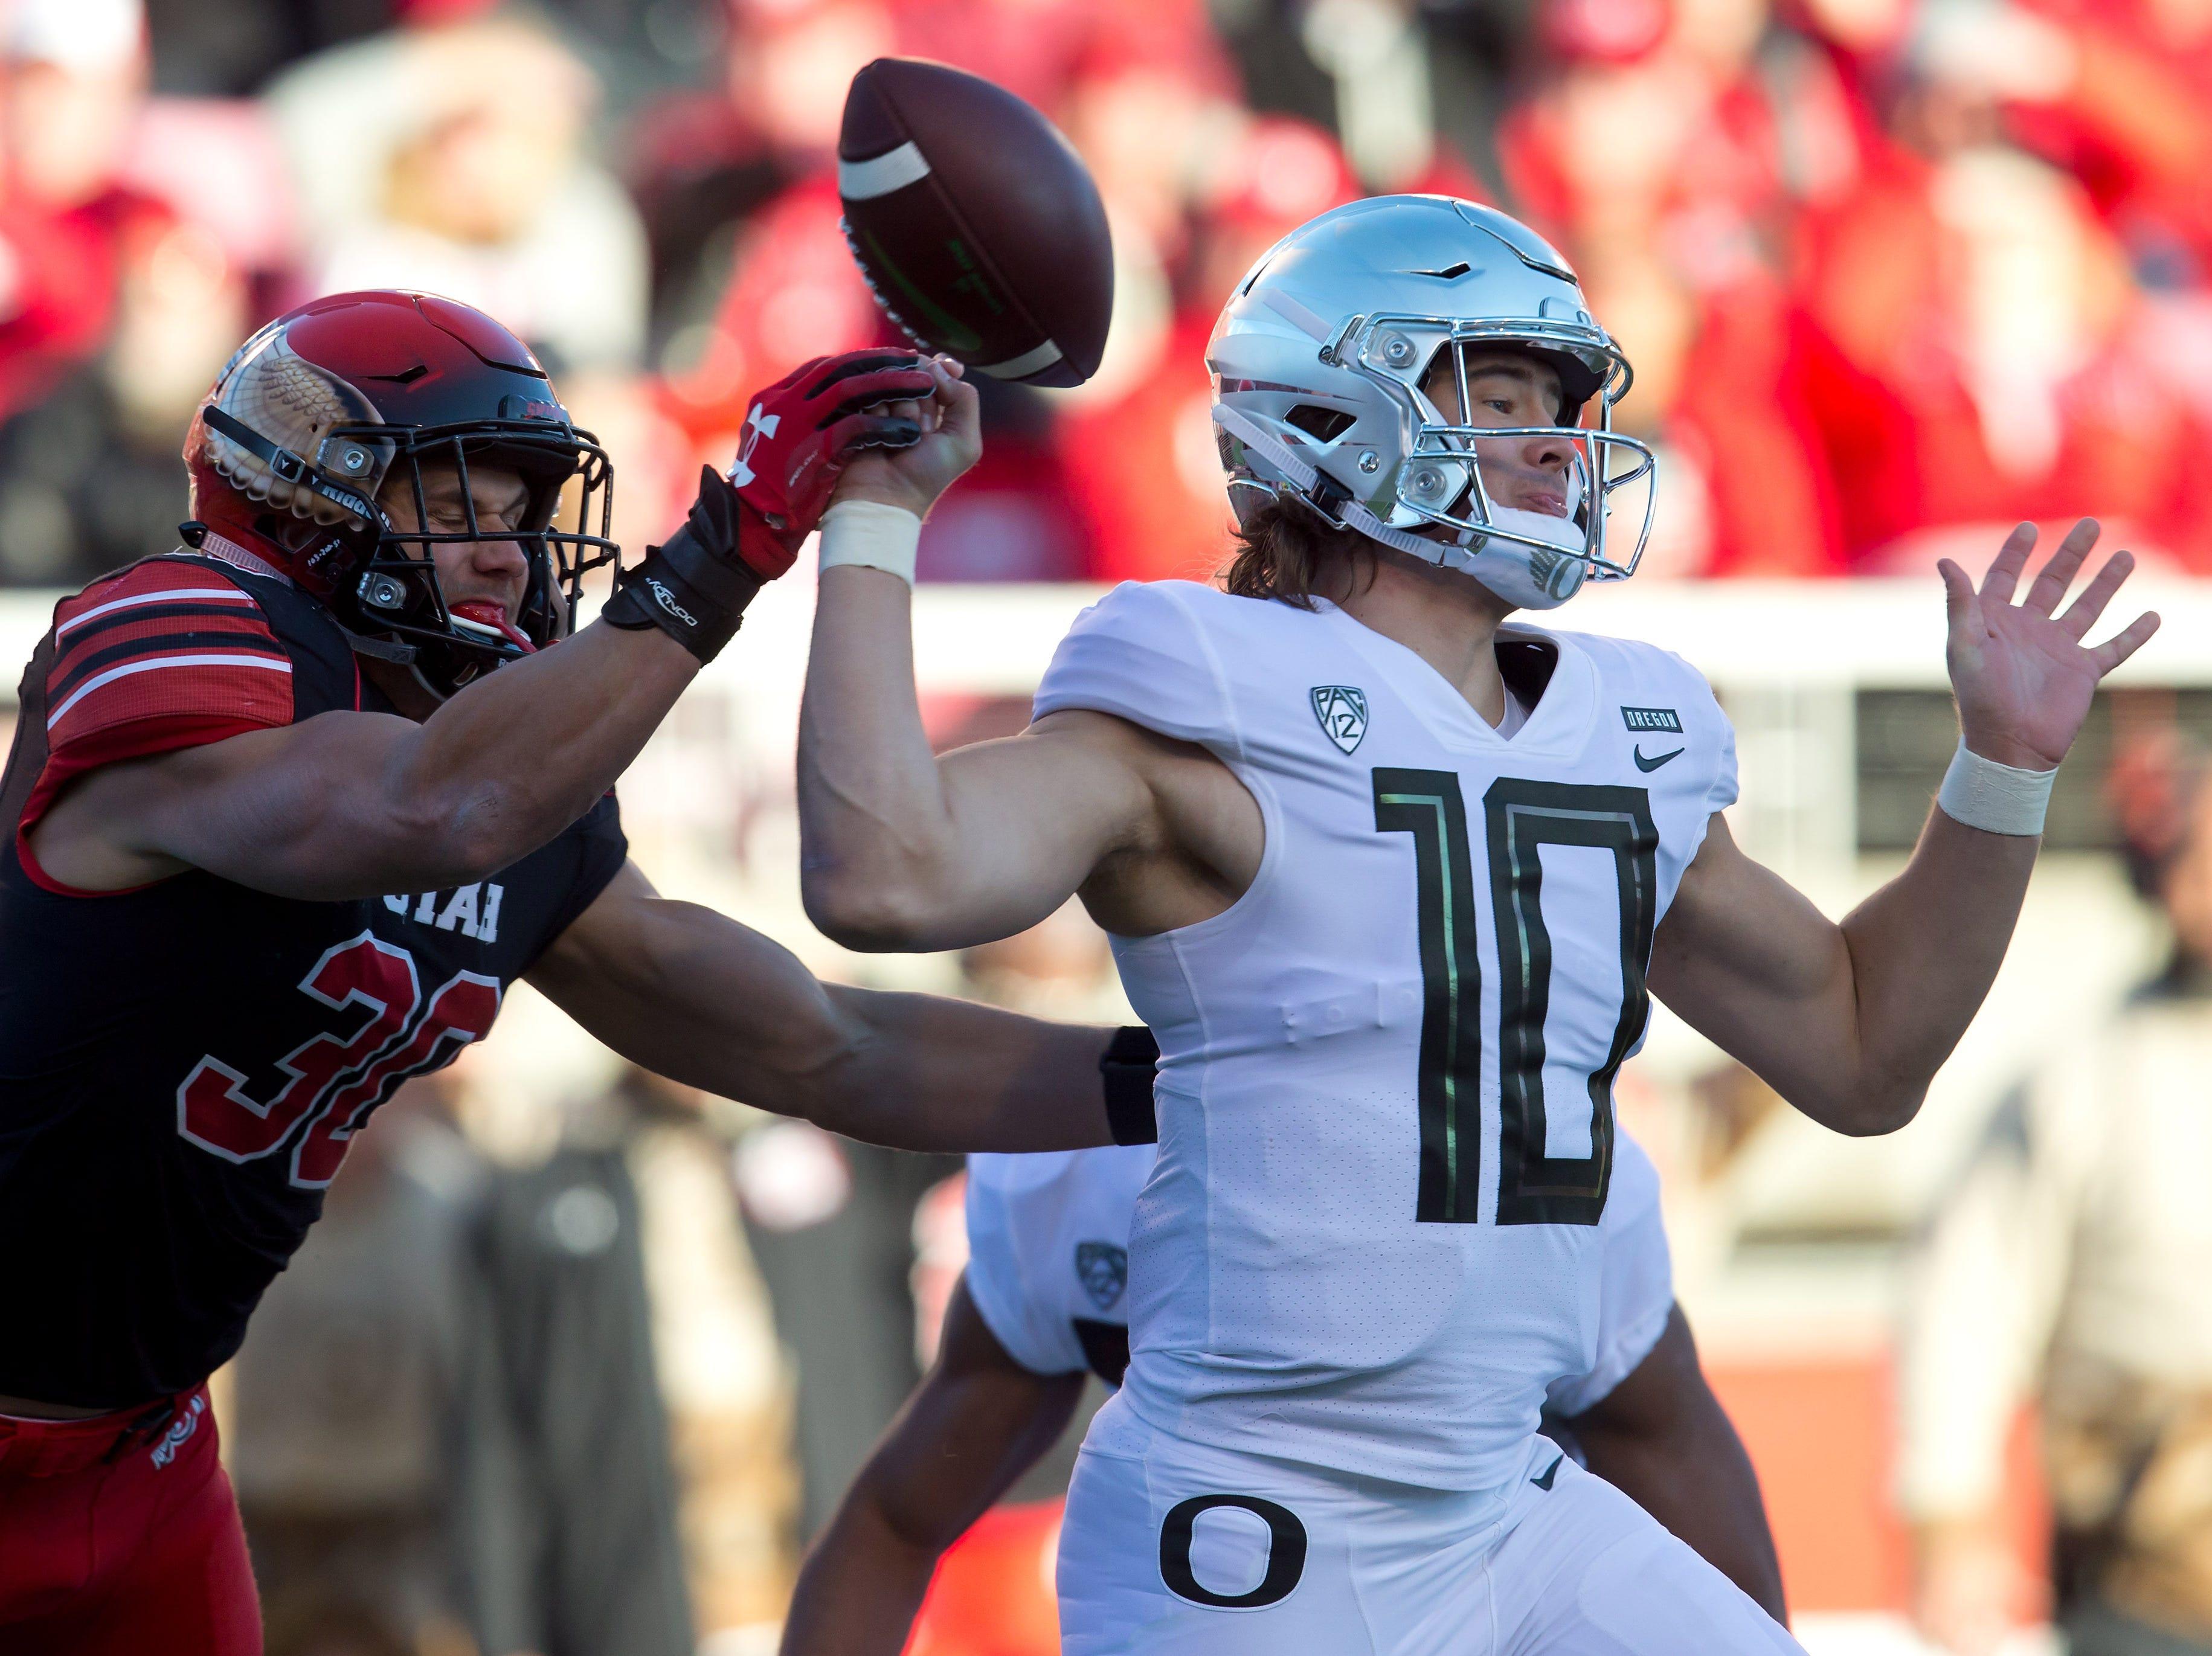 Oregon Ducks football had no business losing to short-handed Utah